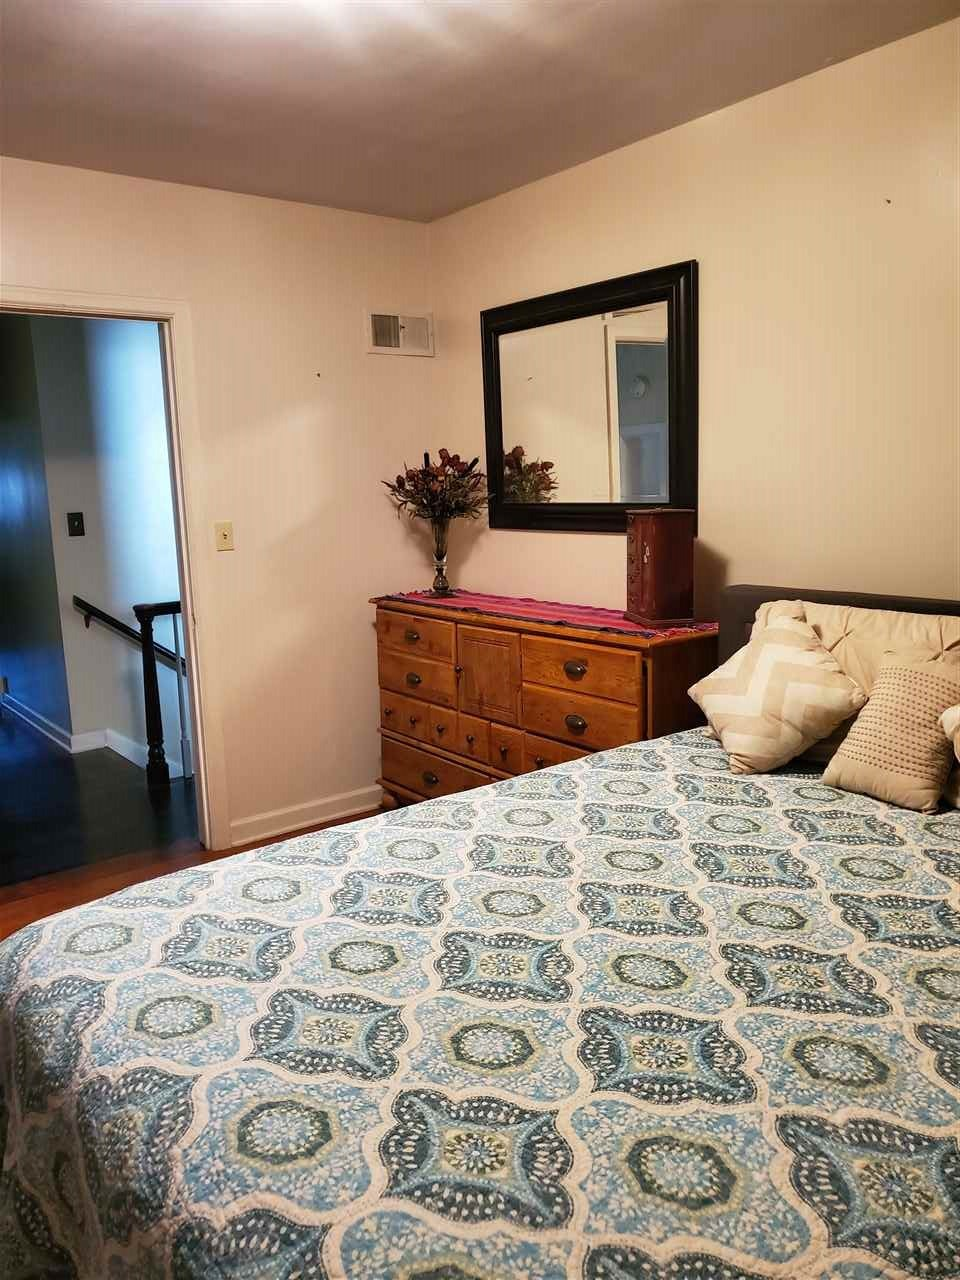 #century21groupone,#homesforsaleponcacity,#poncacityrealestate | 1106 S 7th Street  Ponca City, OK 74601-0 23